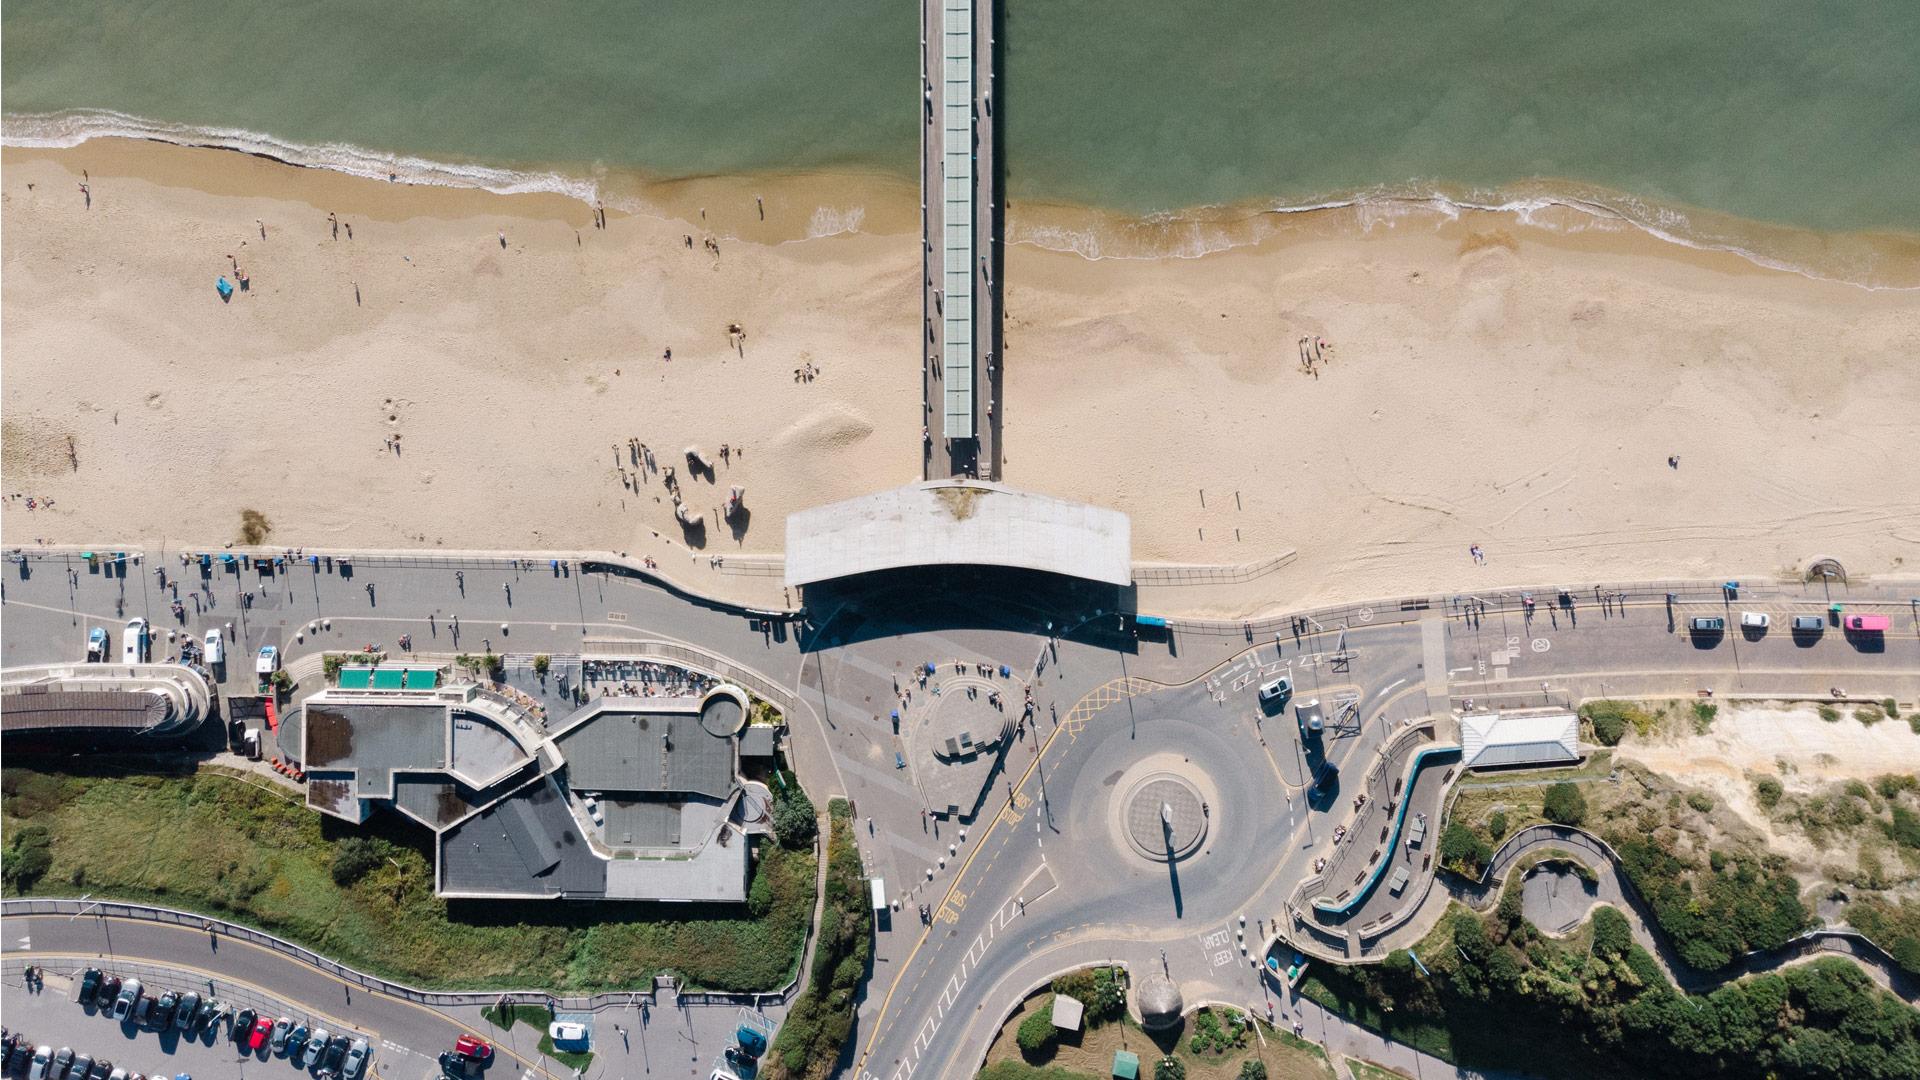 Coastal view of Bournemouth